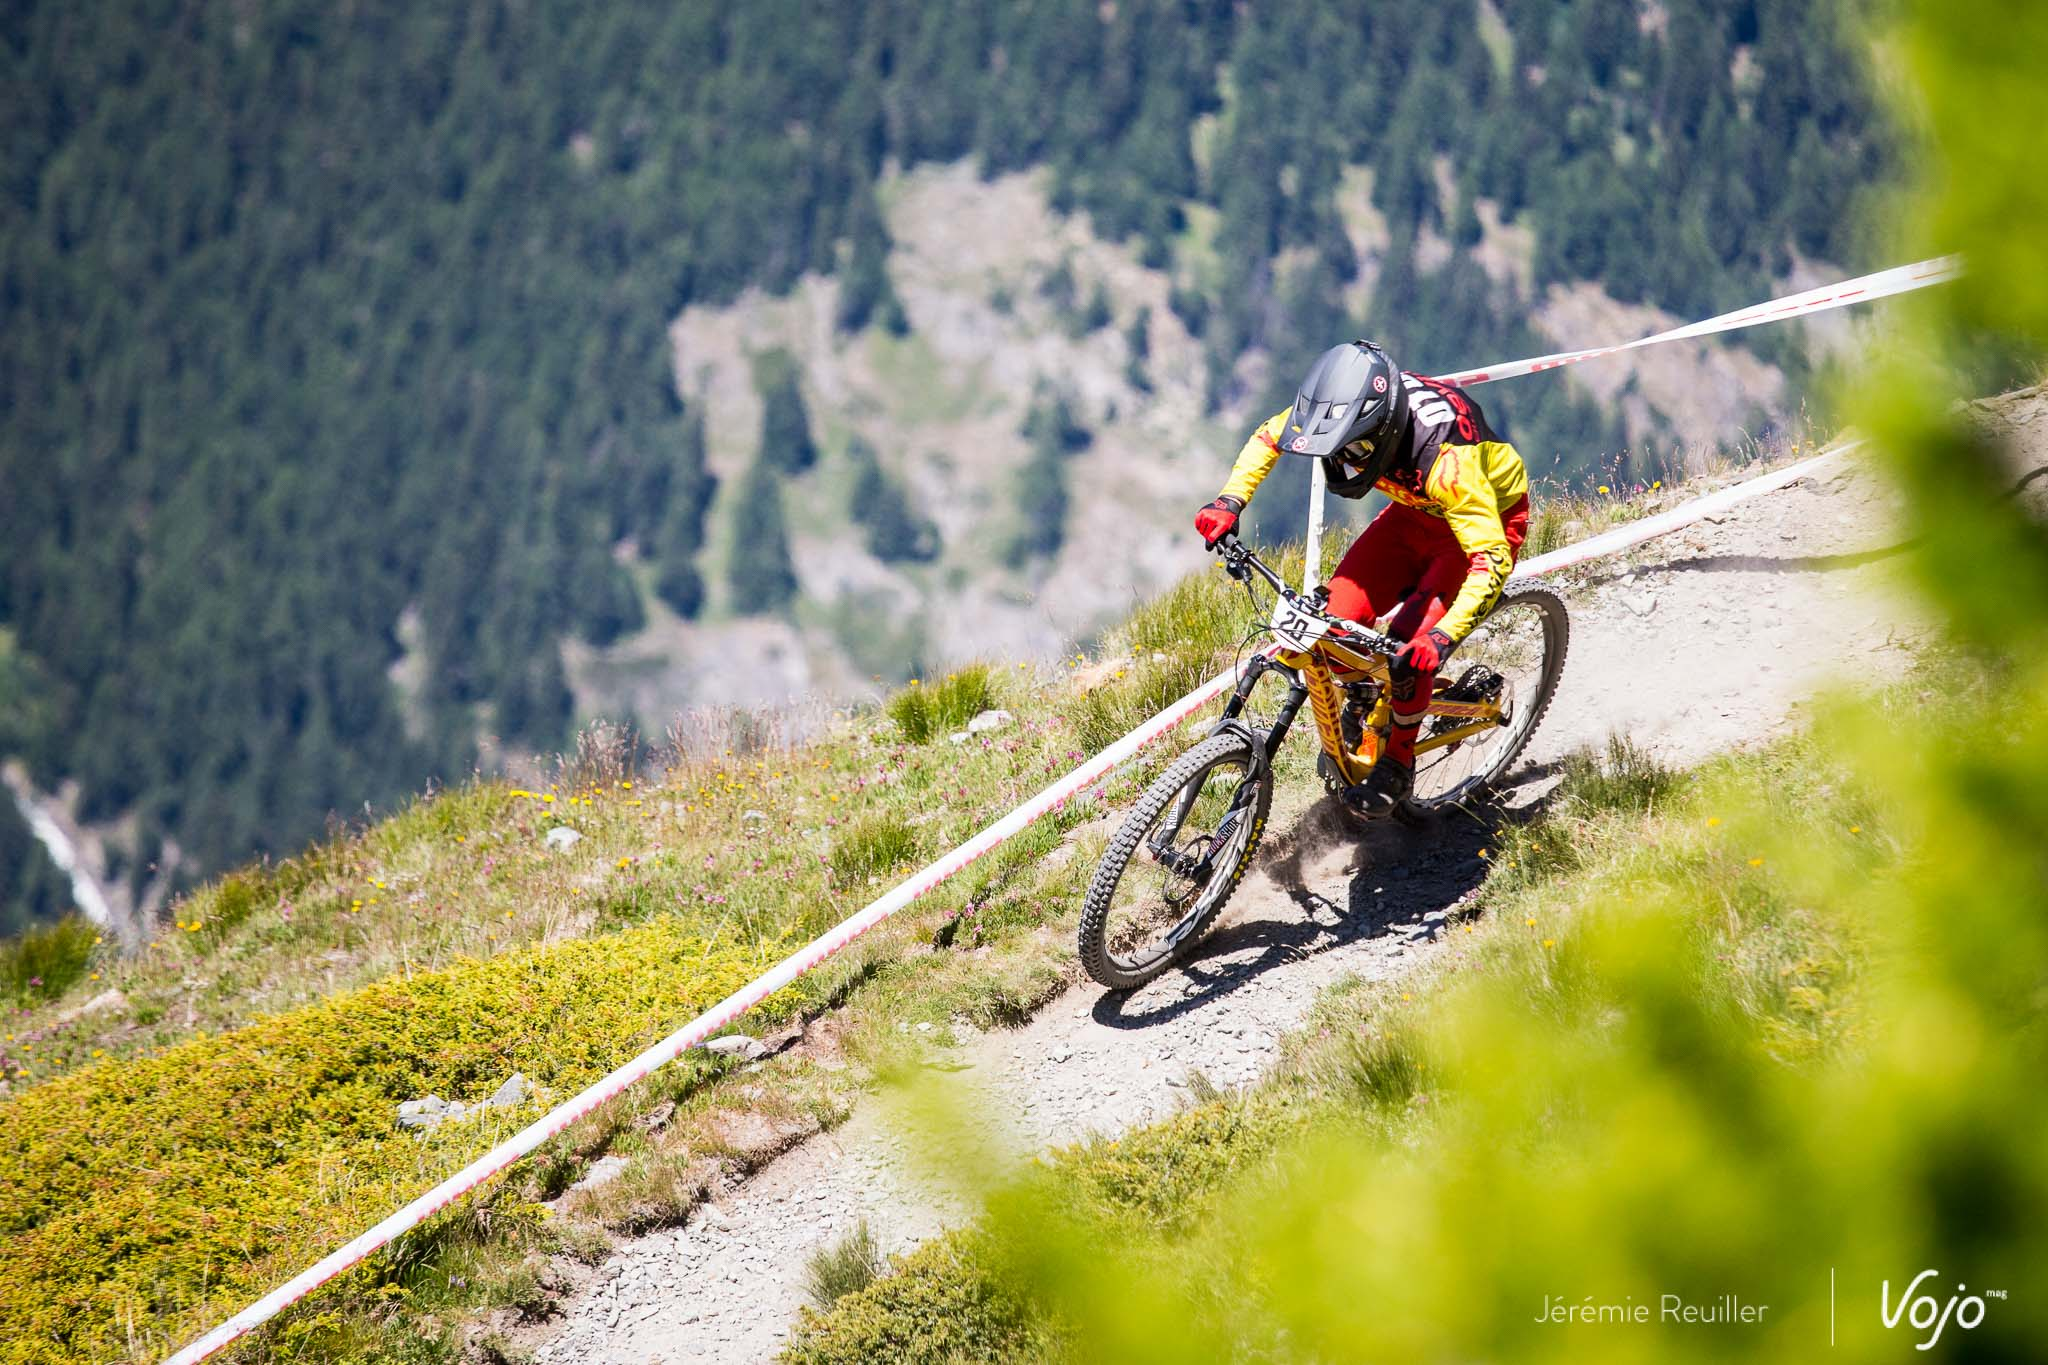 EWS_La_Thuile_raceday_1_Copyright_Reuiller_VojoMag-32